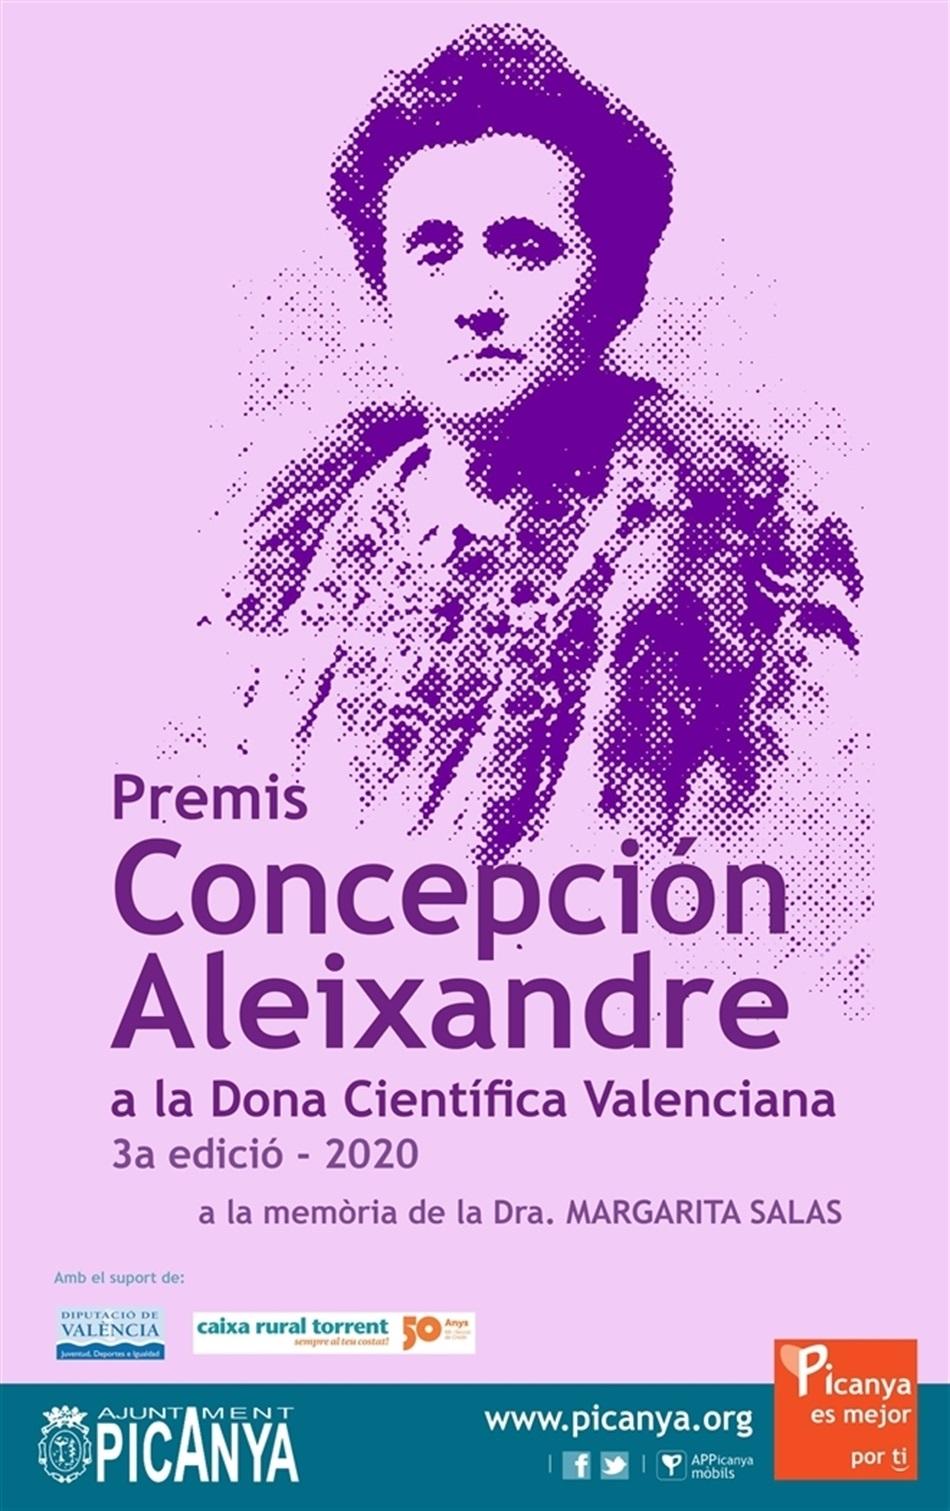 premi_concepcion_alexandre_cartell_2020